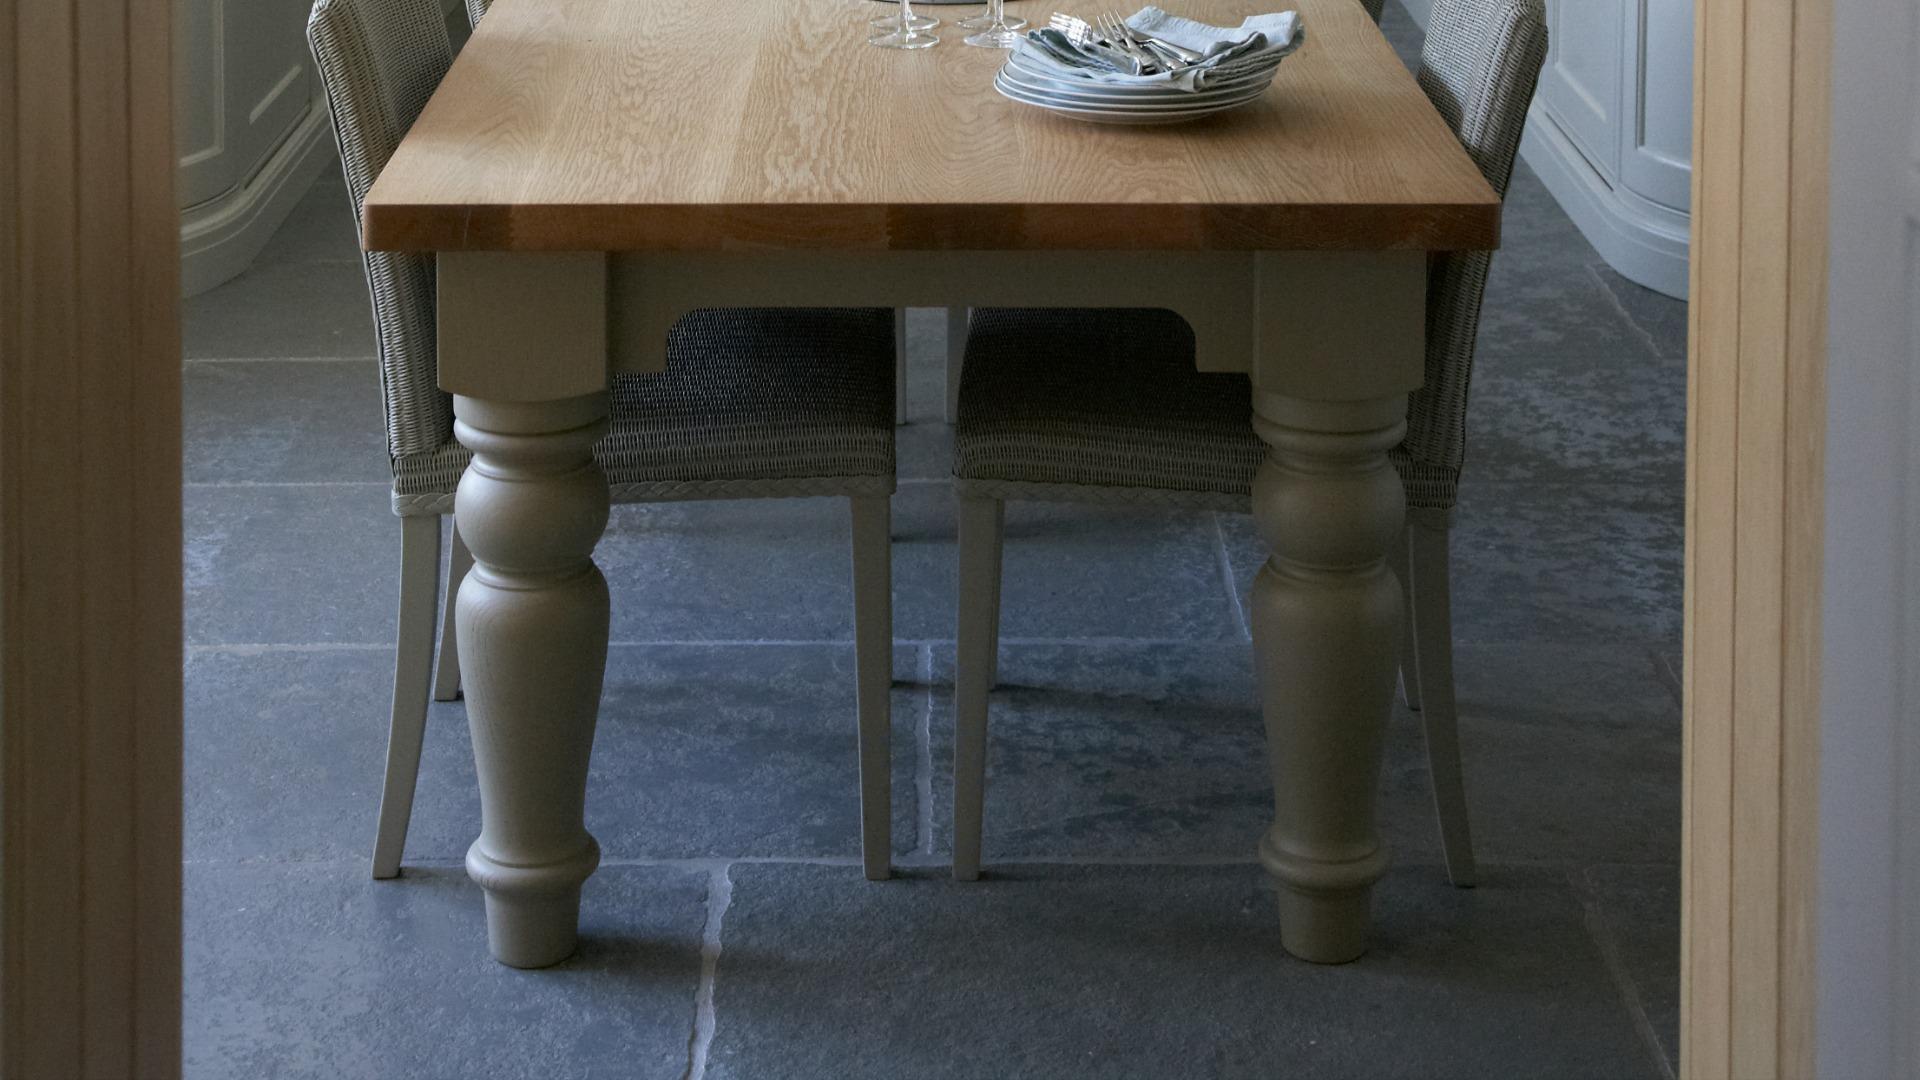 Blenheim Limestone Tumbled - Humphrey Munson Stone Atelier - St Albans